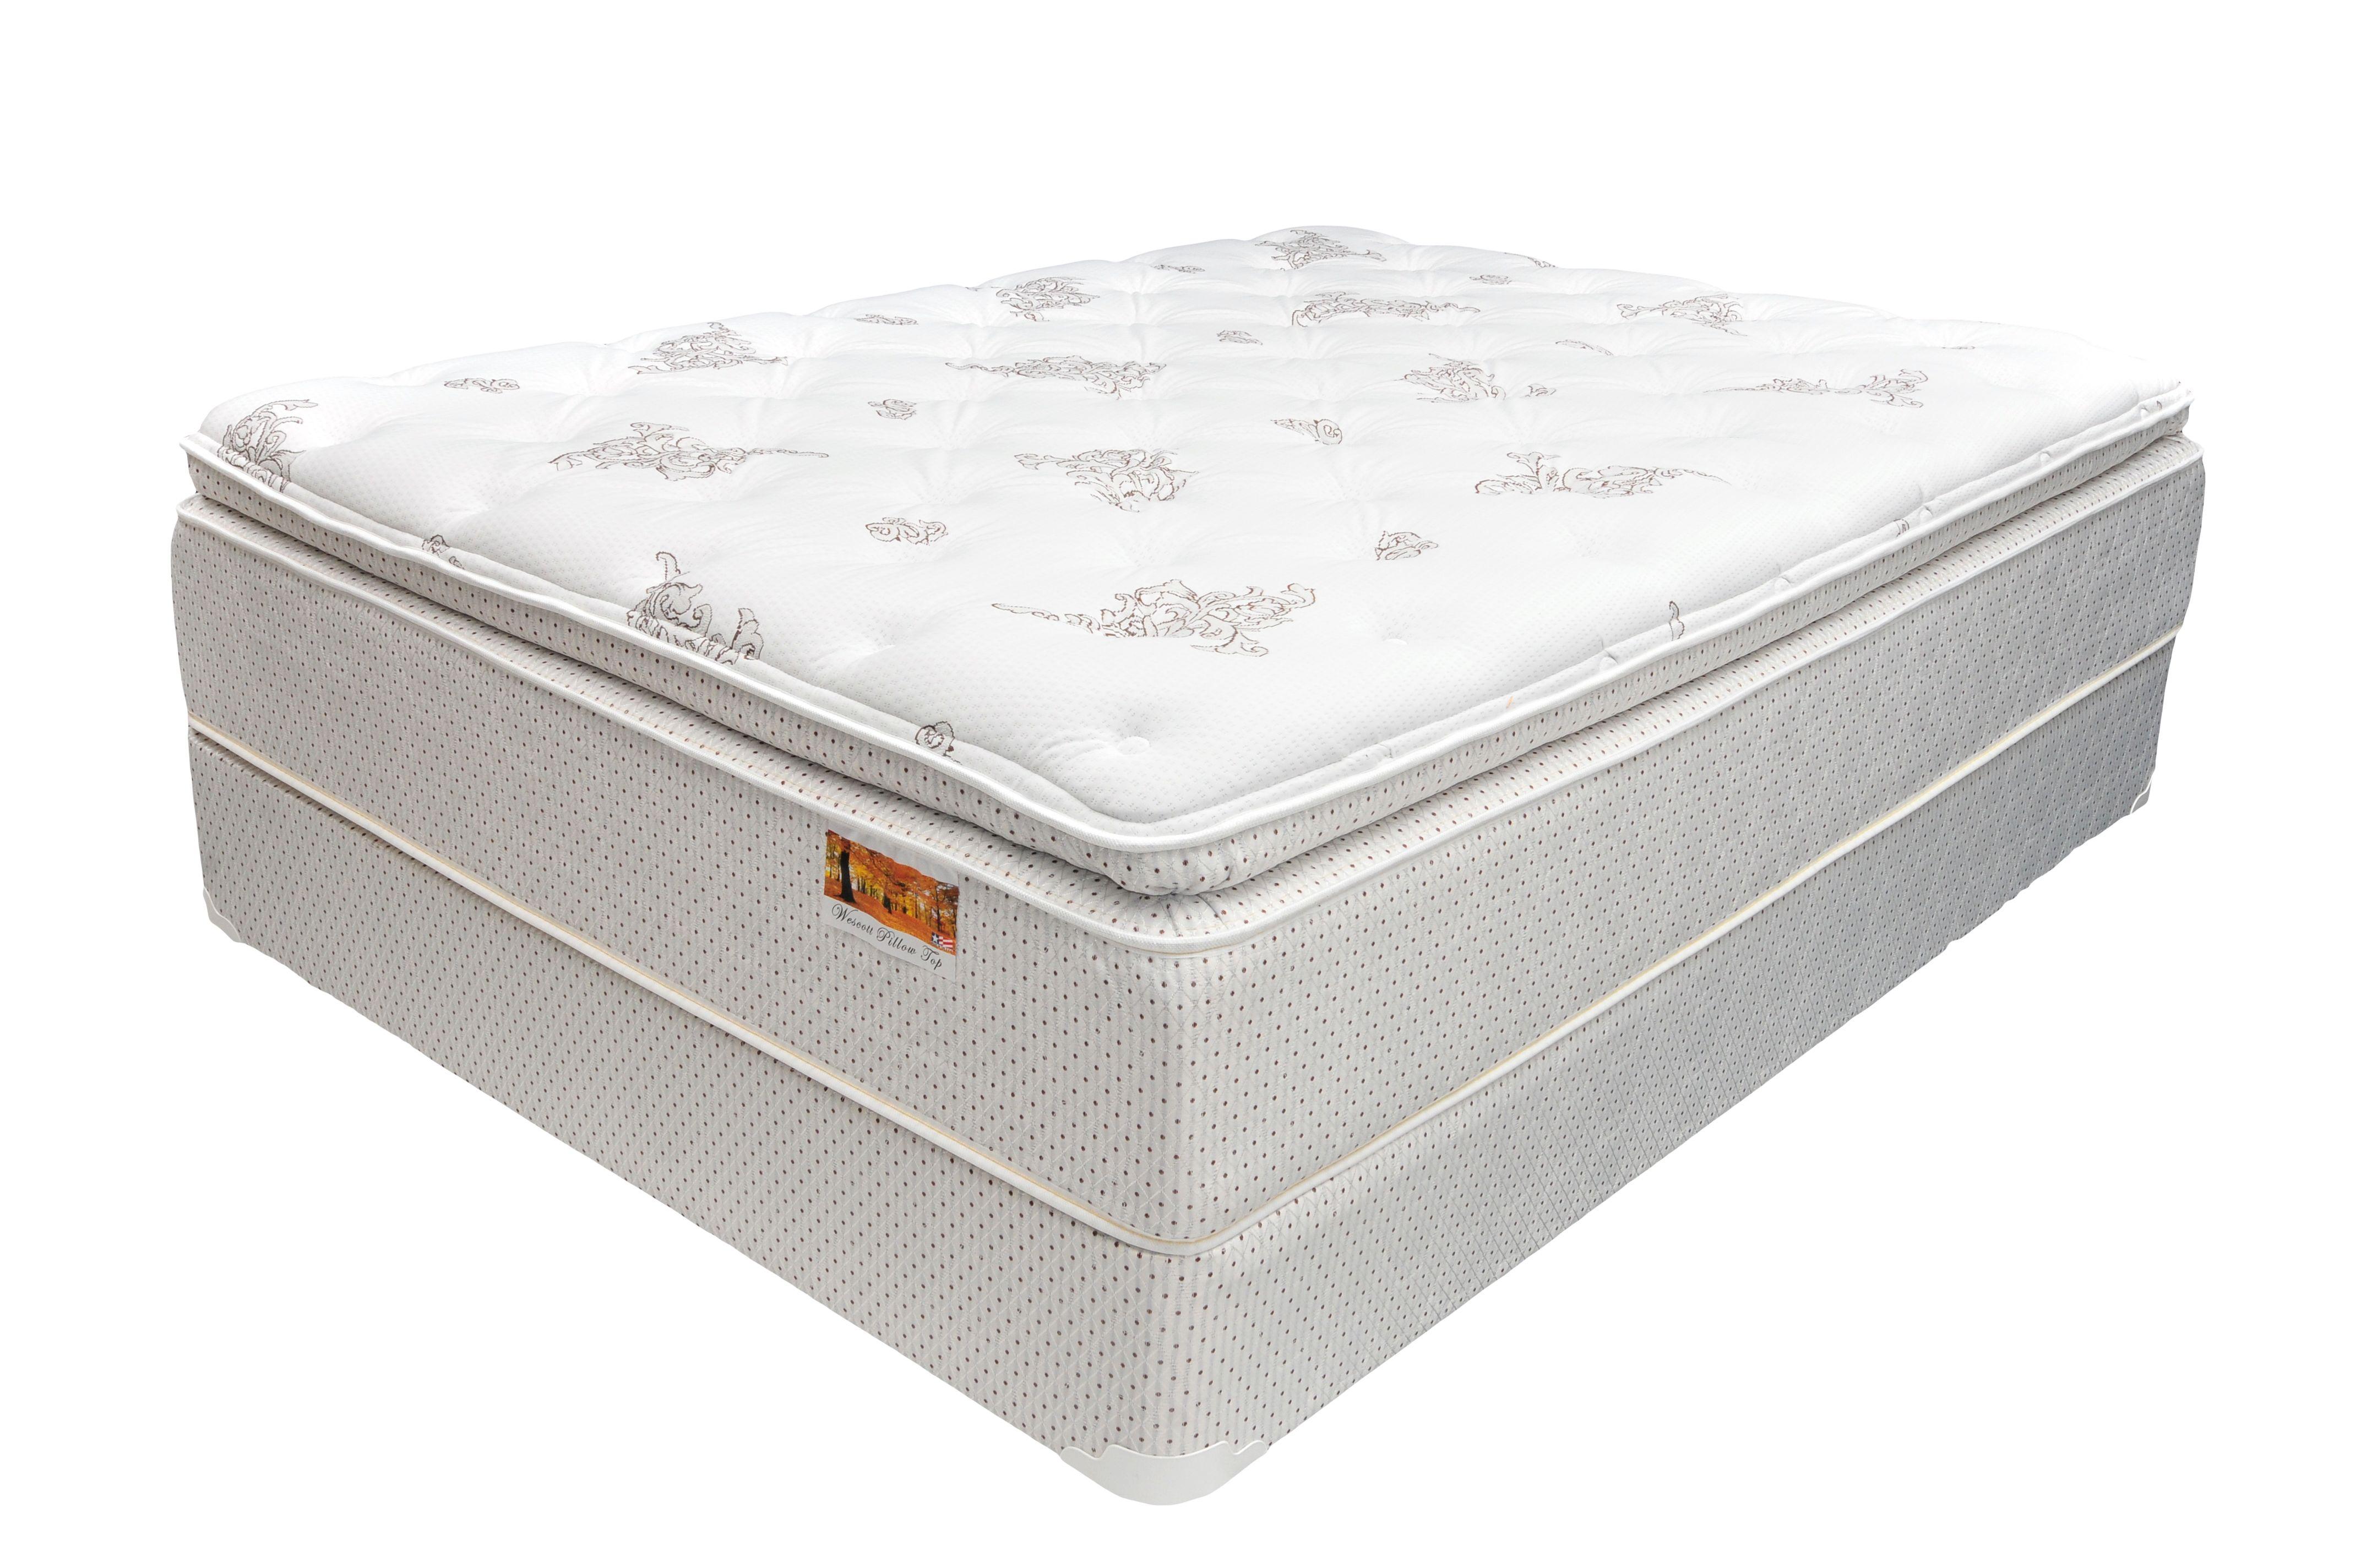 Buy Corsicana Bedding Marden Pillow Top Queen Mattress Set At Leon